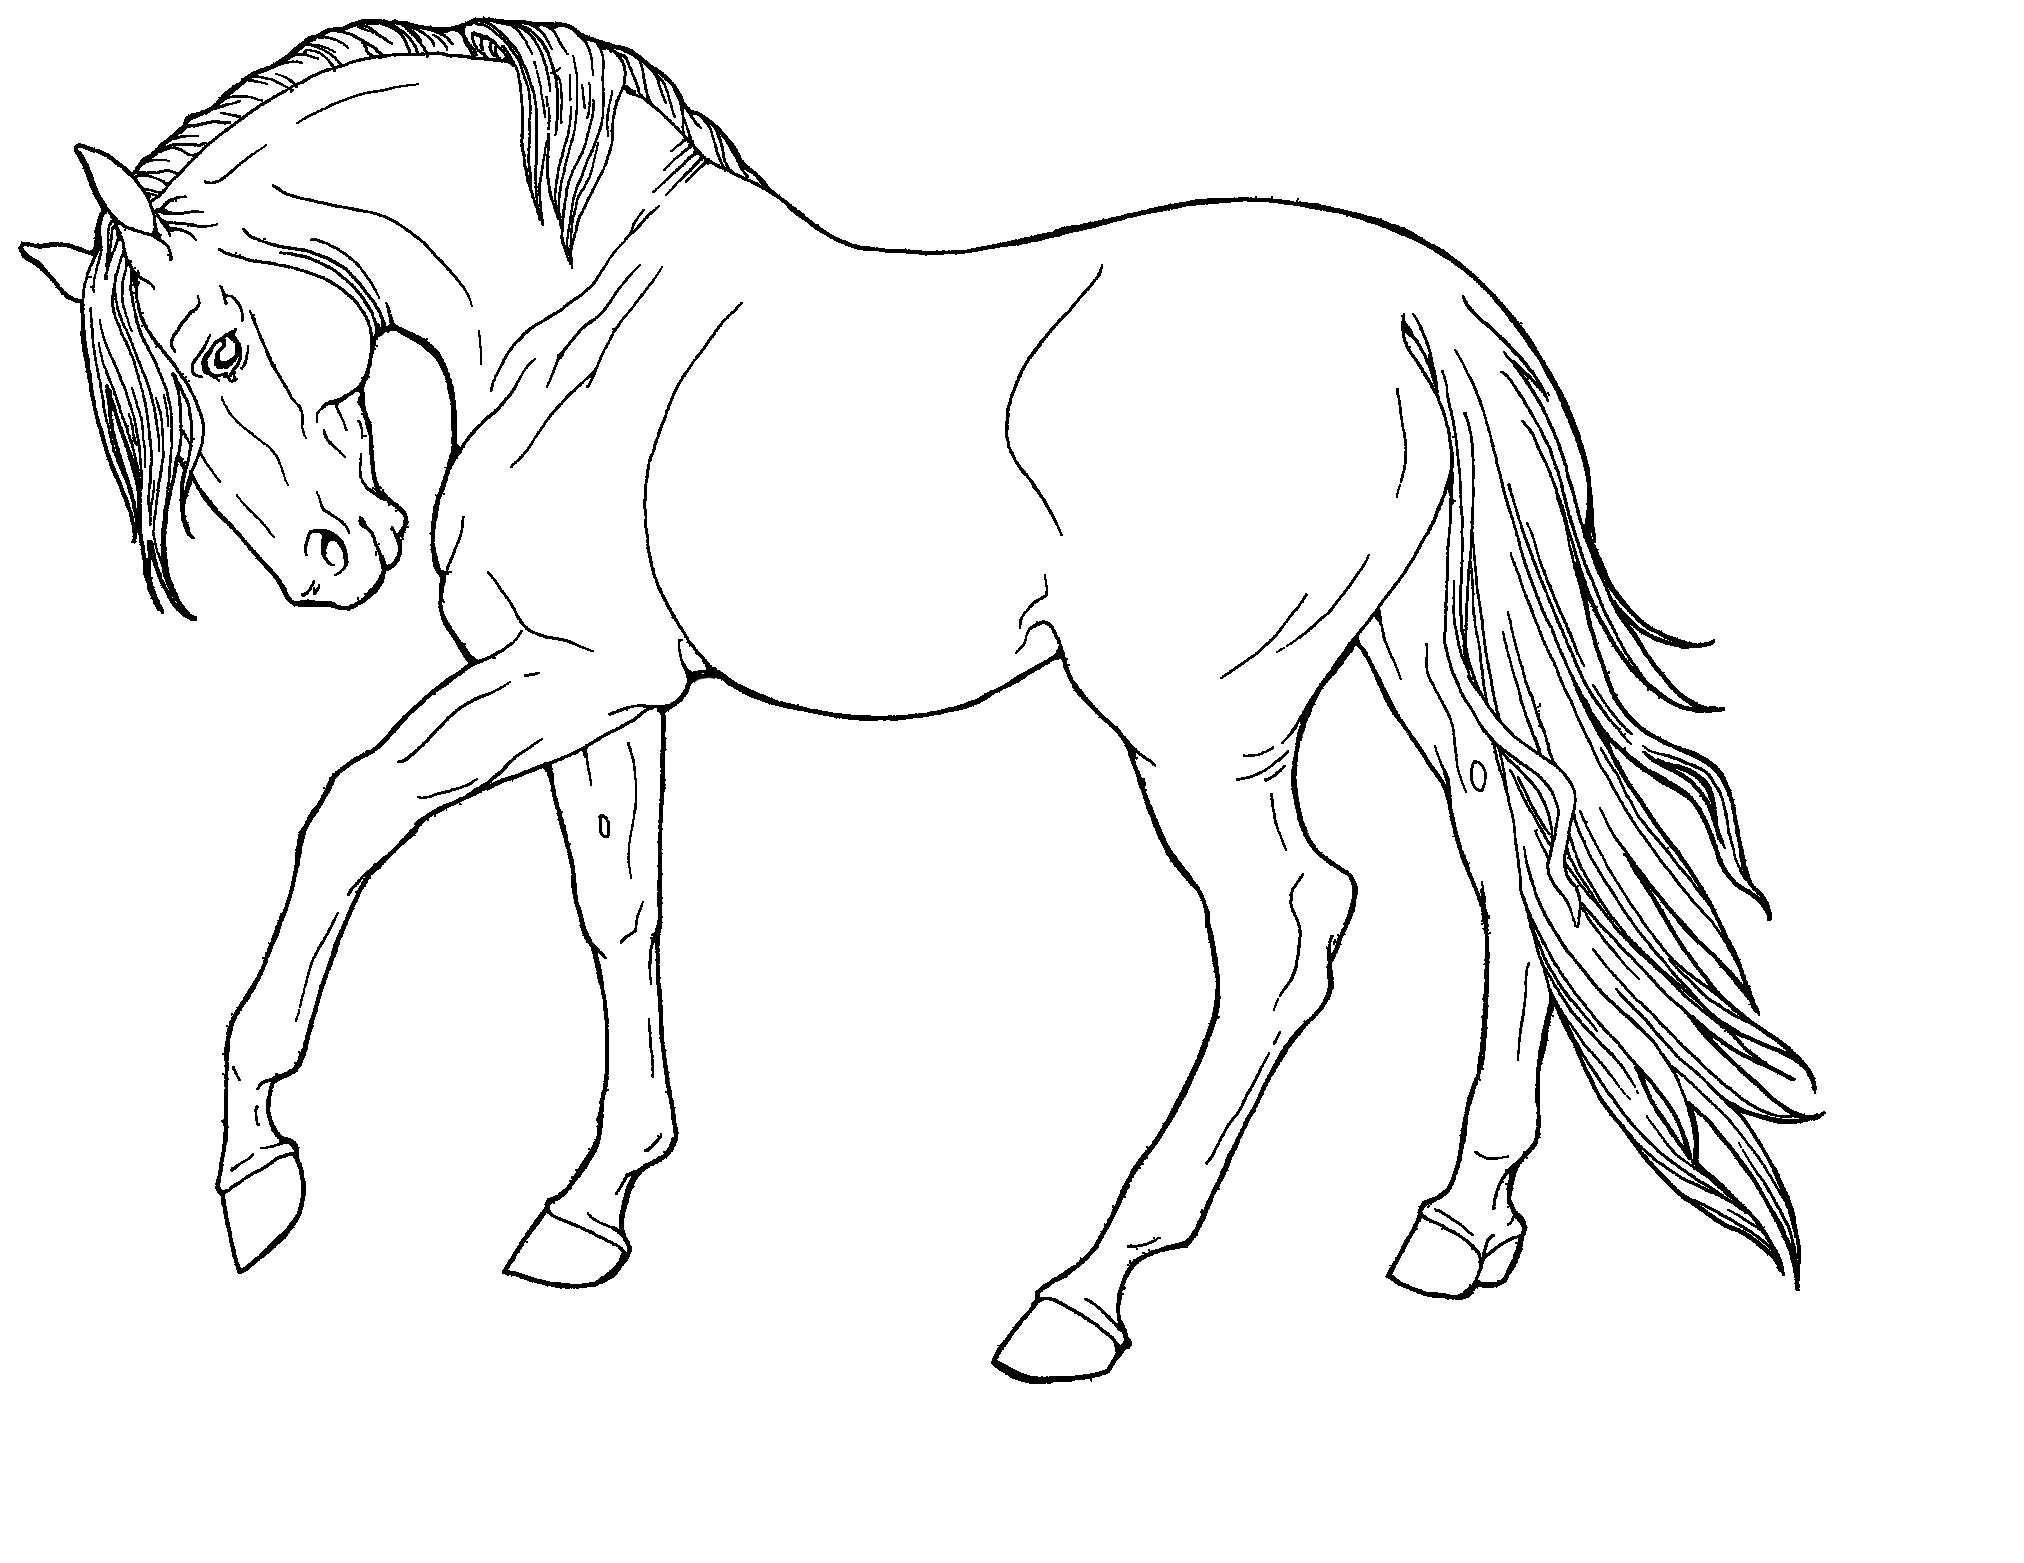 Free line art fine horse by applehunter on deviantart for Fine art coloring pages